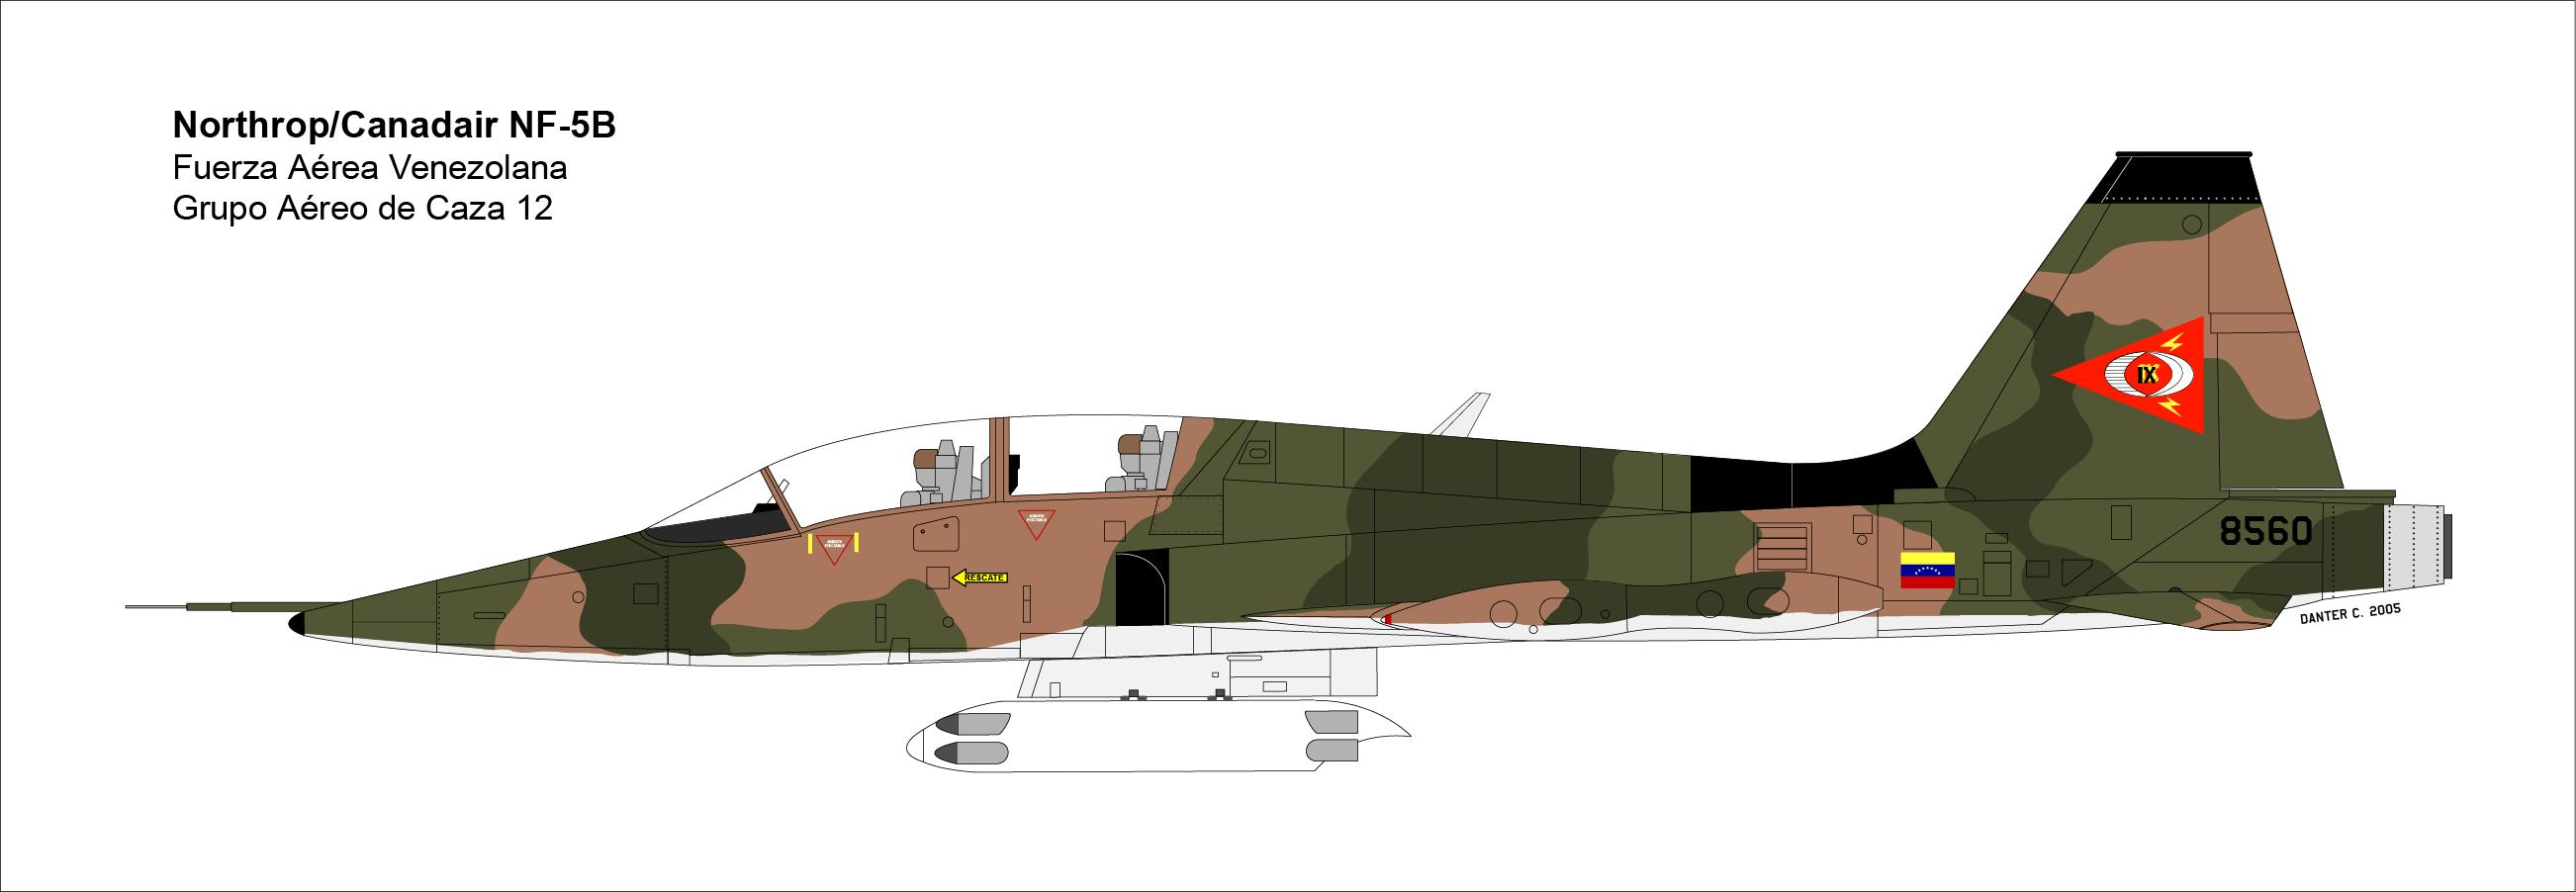 L-15 para la Fuerza Aerea Venezolana 138_2